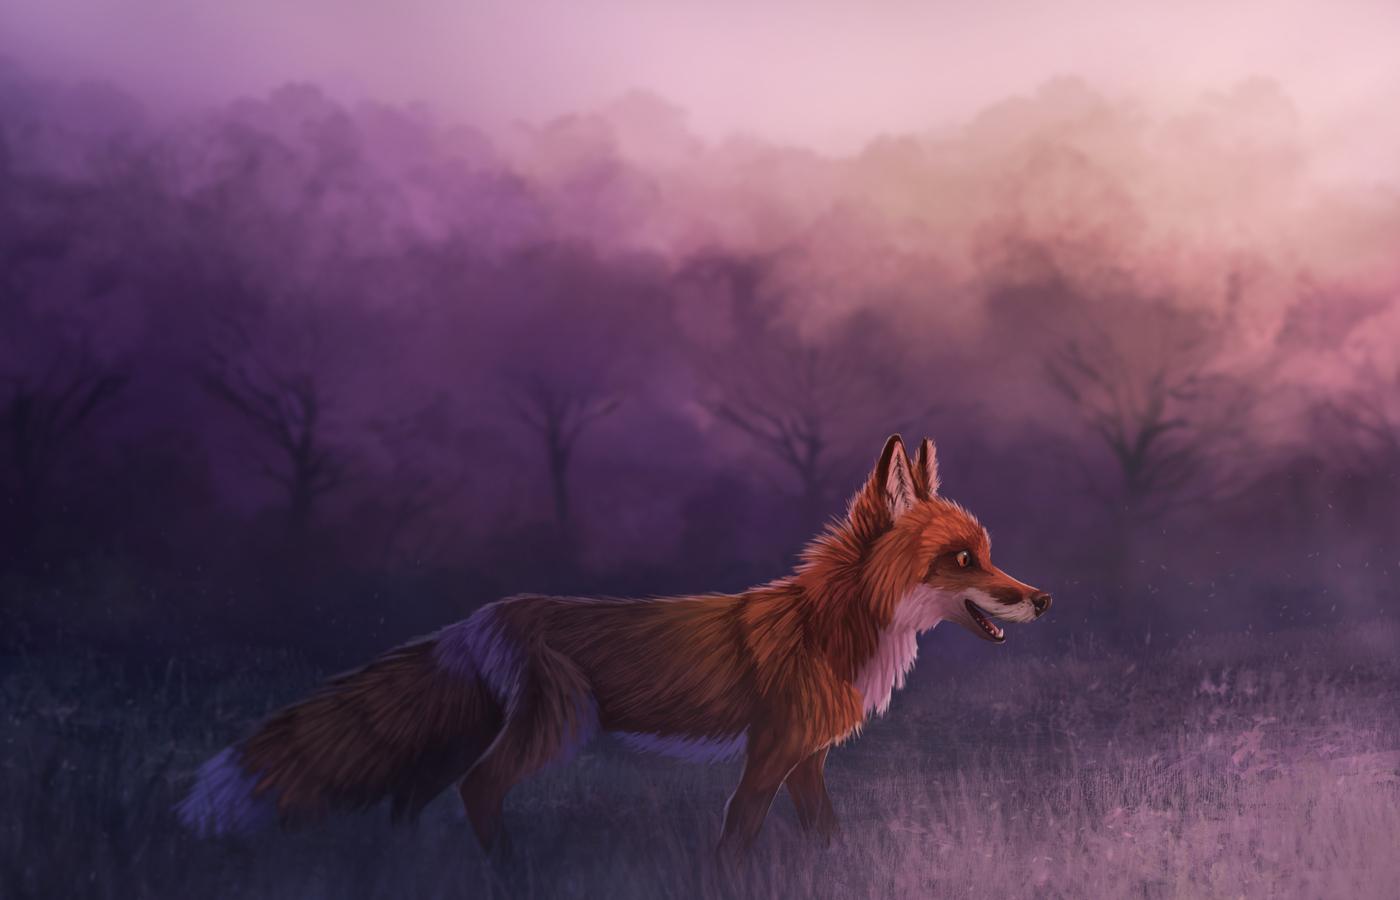 misty-red-fox-4k-cj.jpg